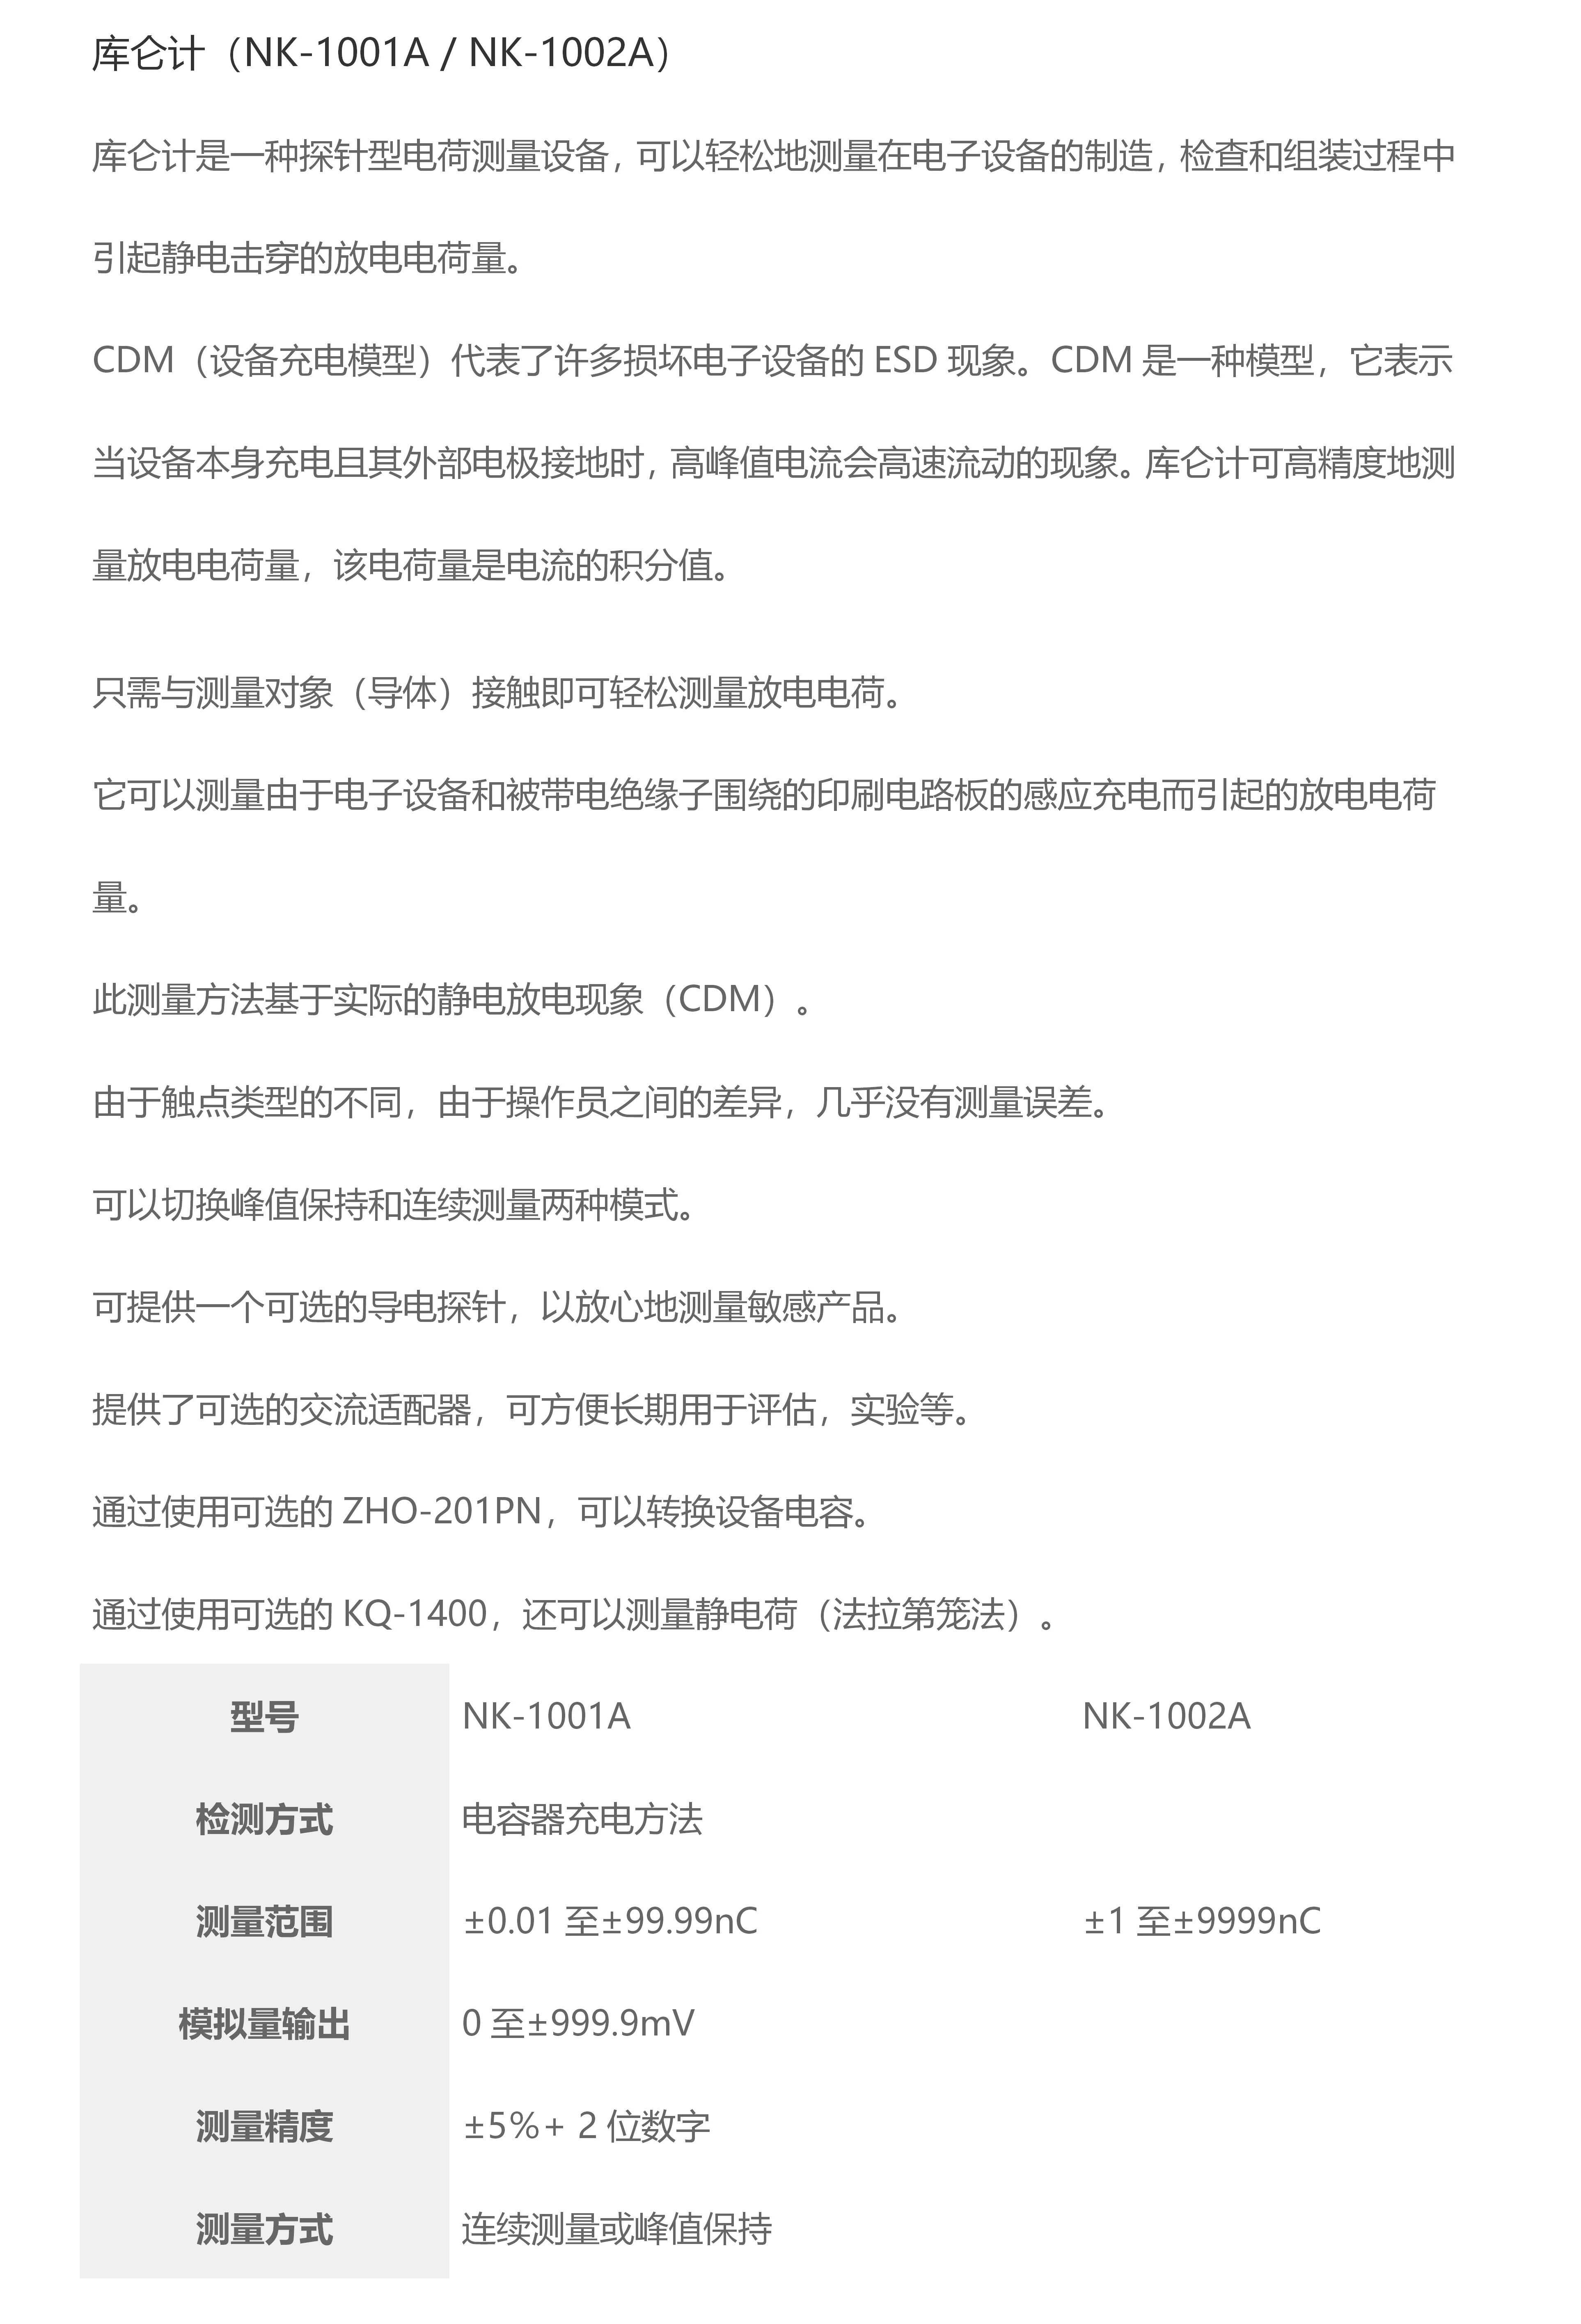 NK1001A-1002A_01.jpg